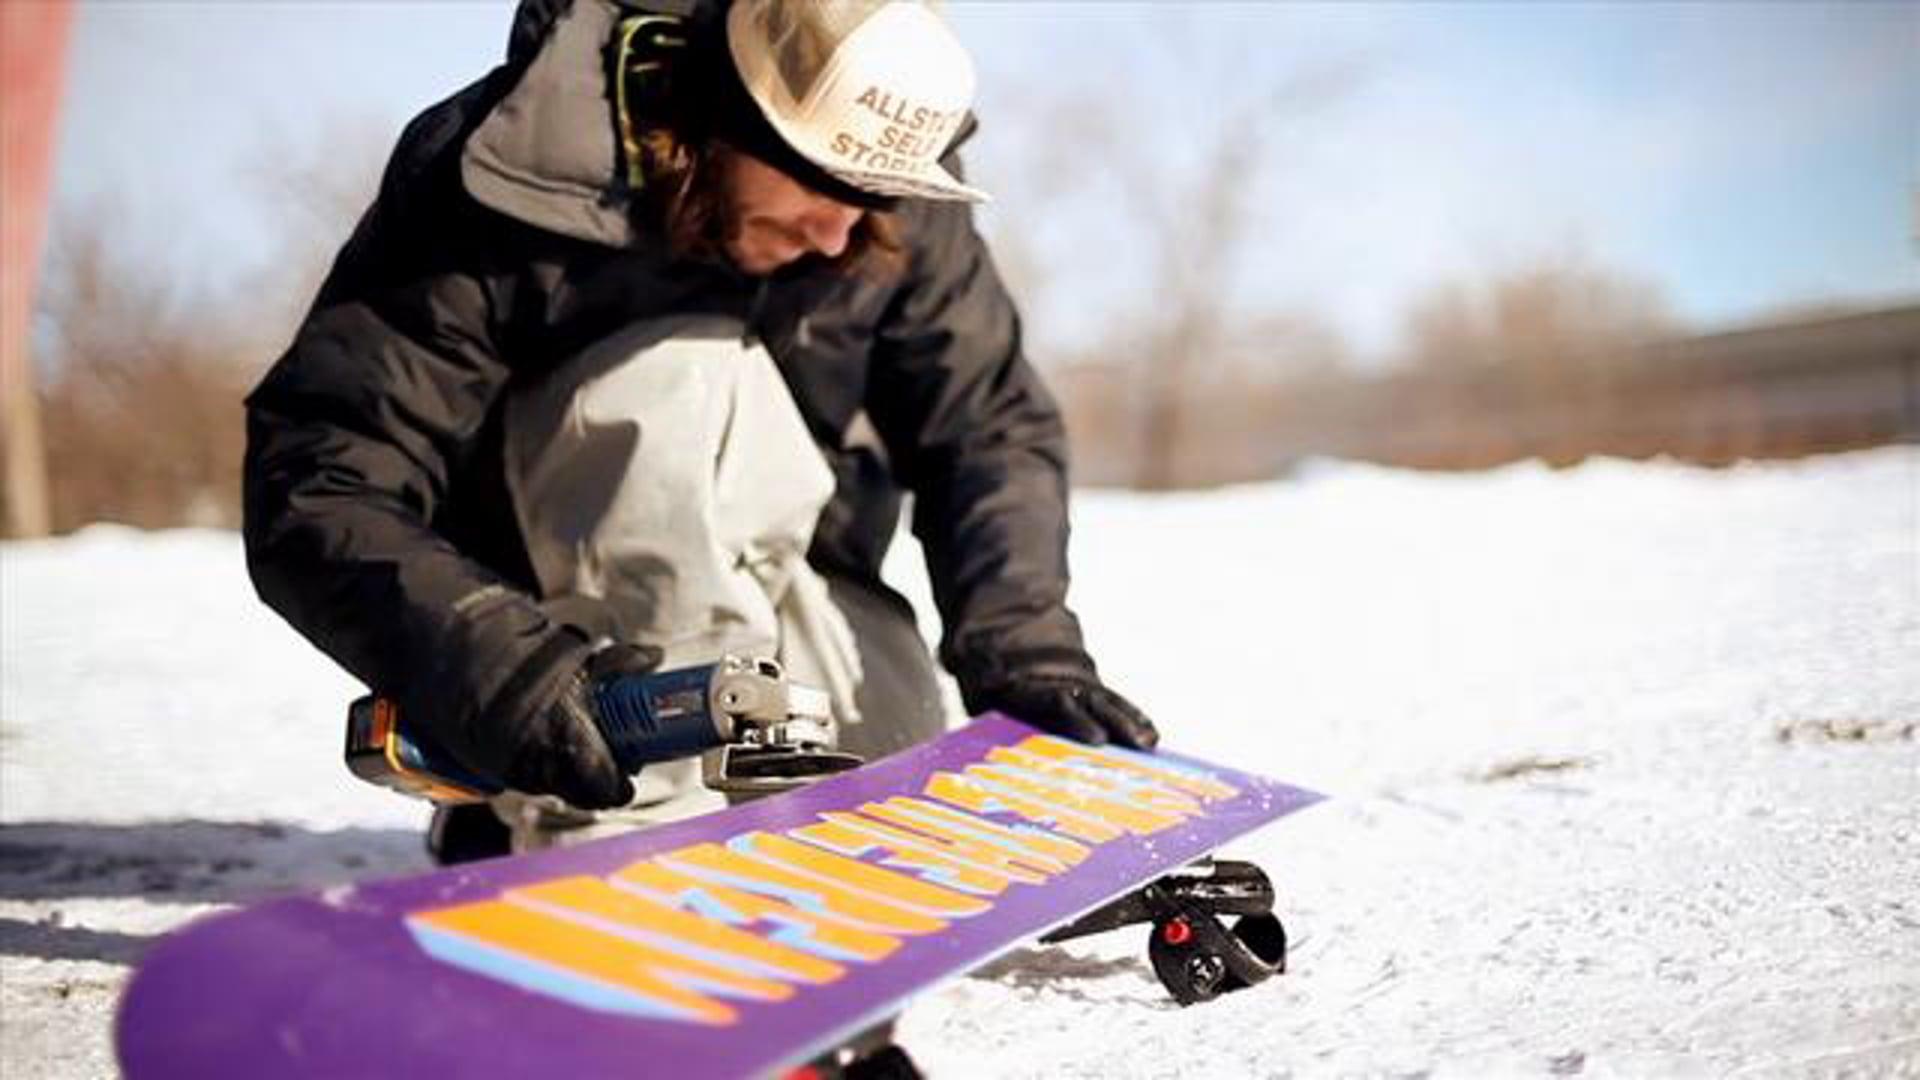 ACTION SPORTS: Jeremy Jones B Section | Burton Board Film | 2010